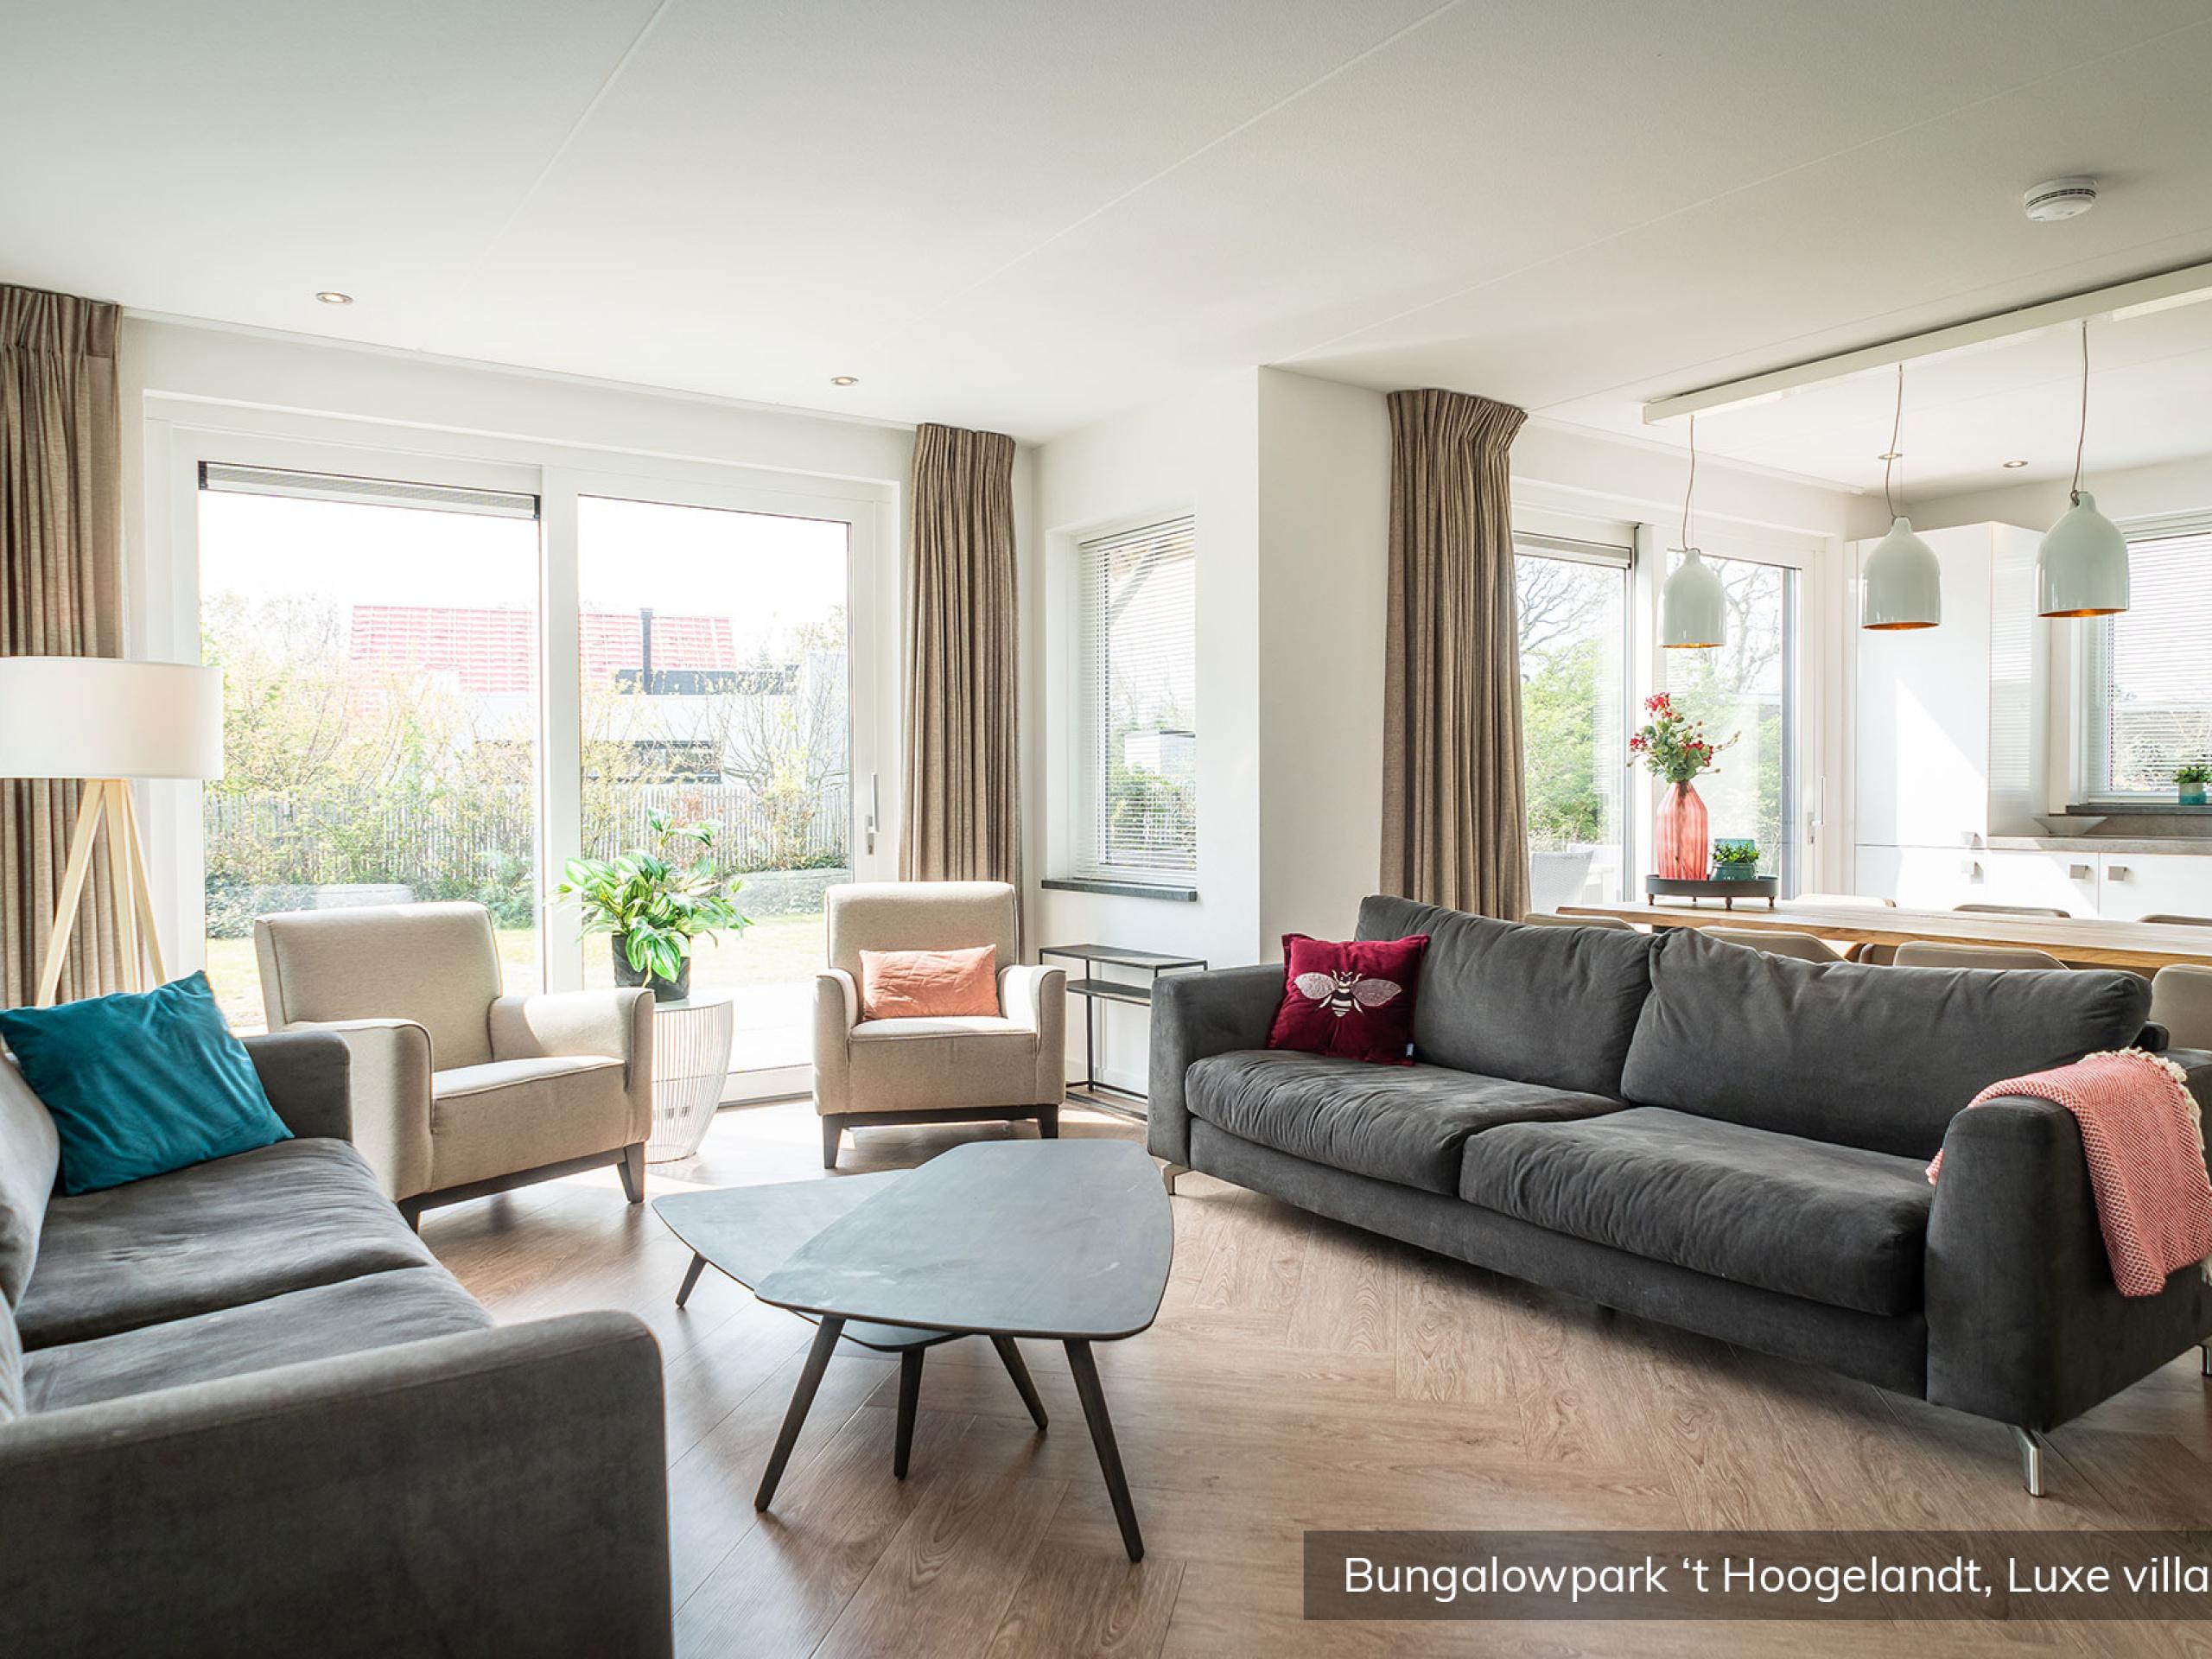 Enjoy the luxury villa in a quiet location near De Koog